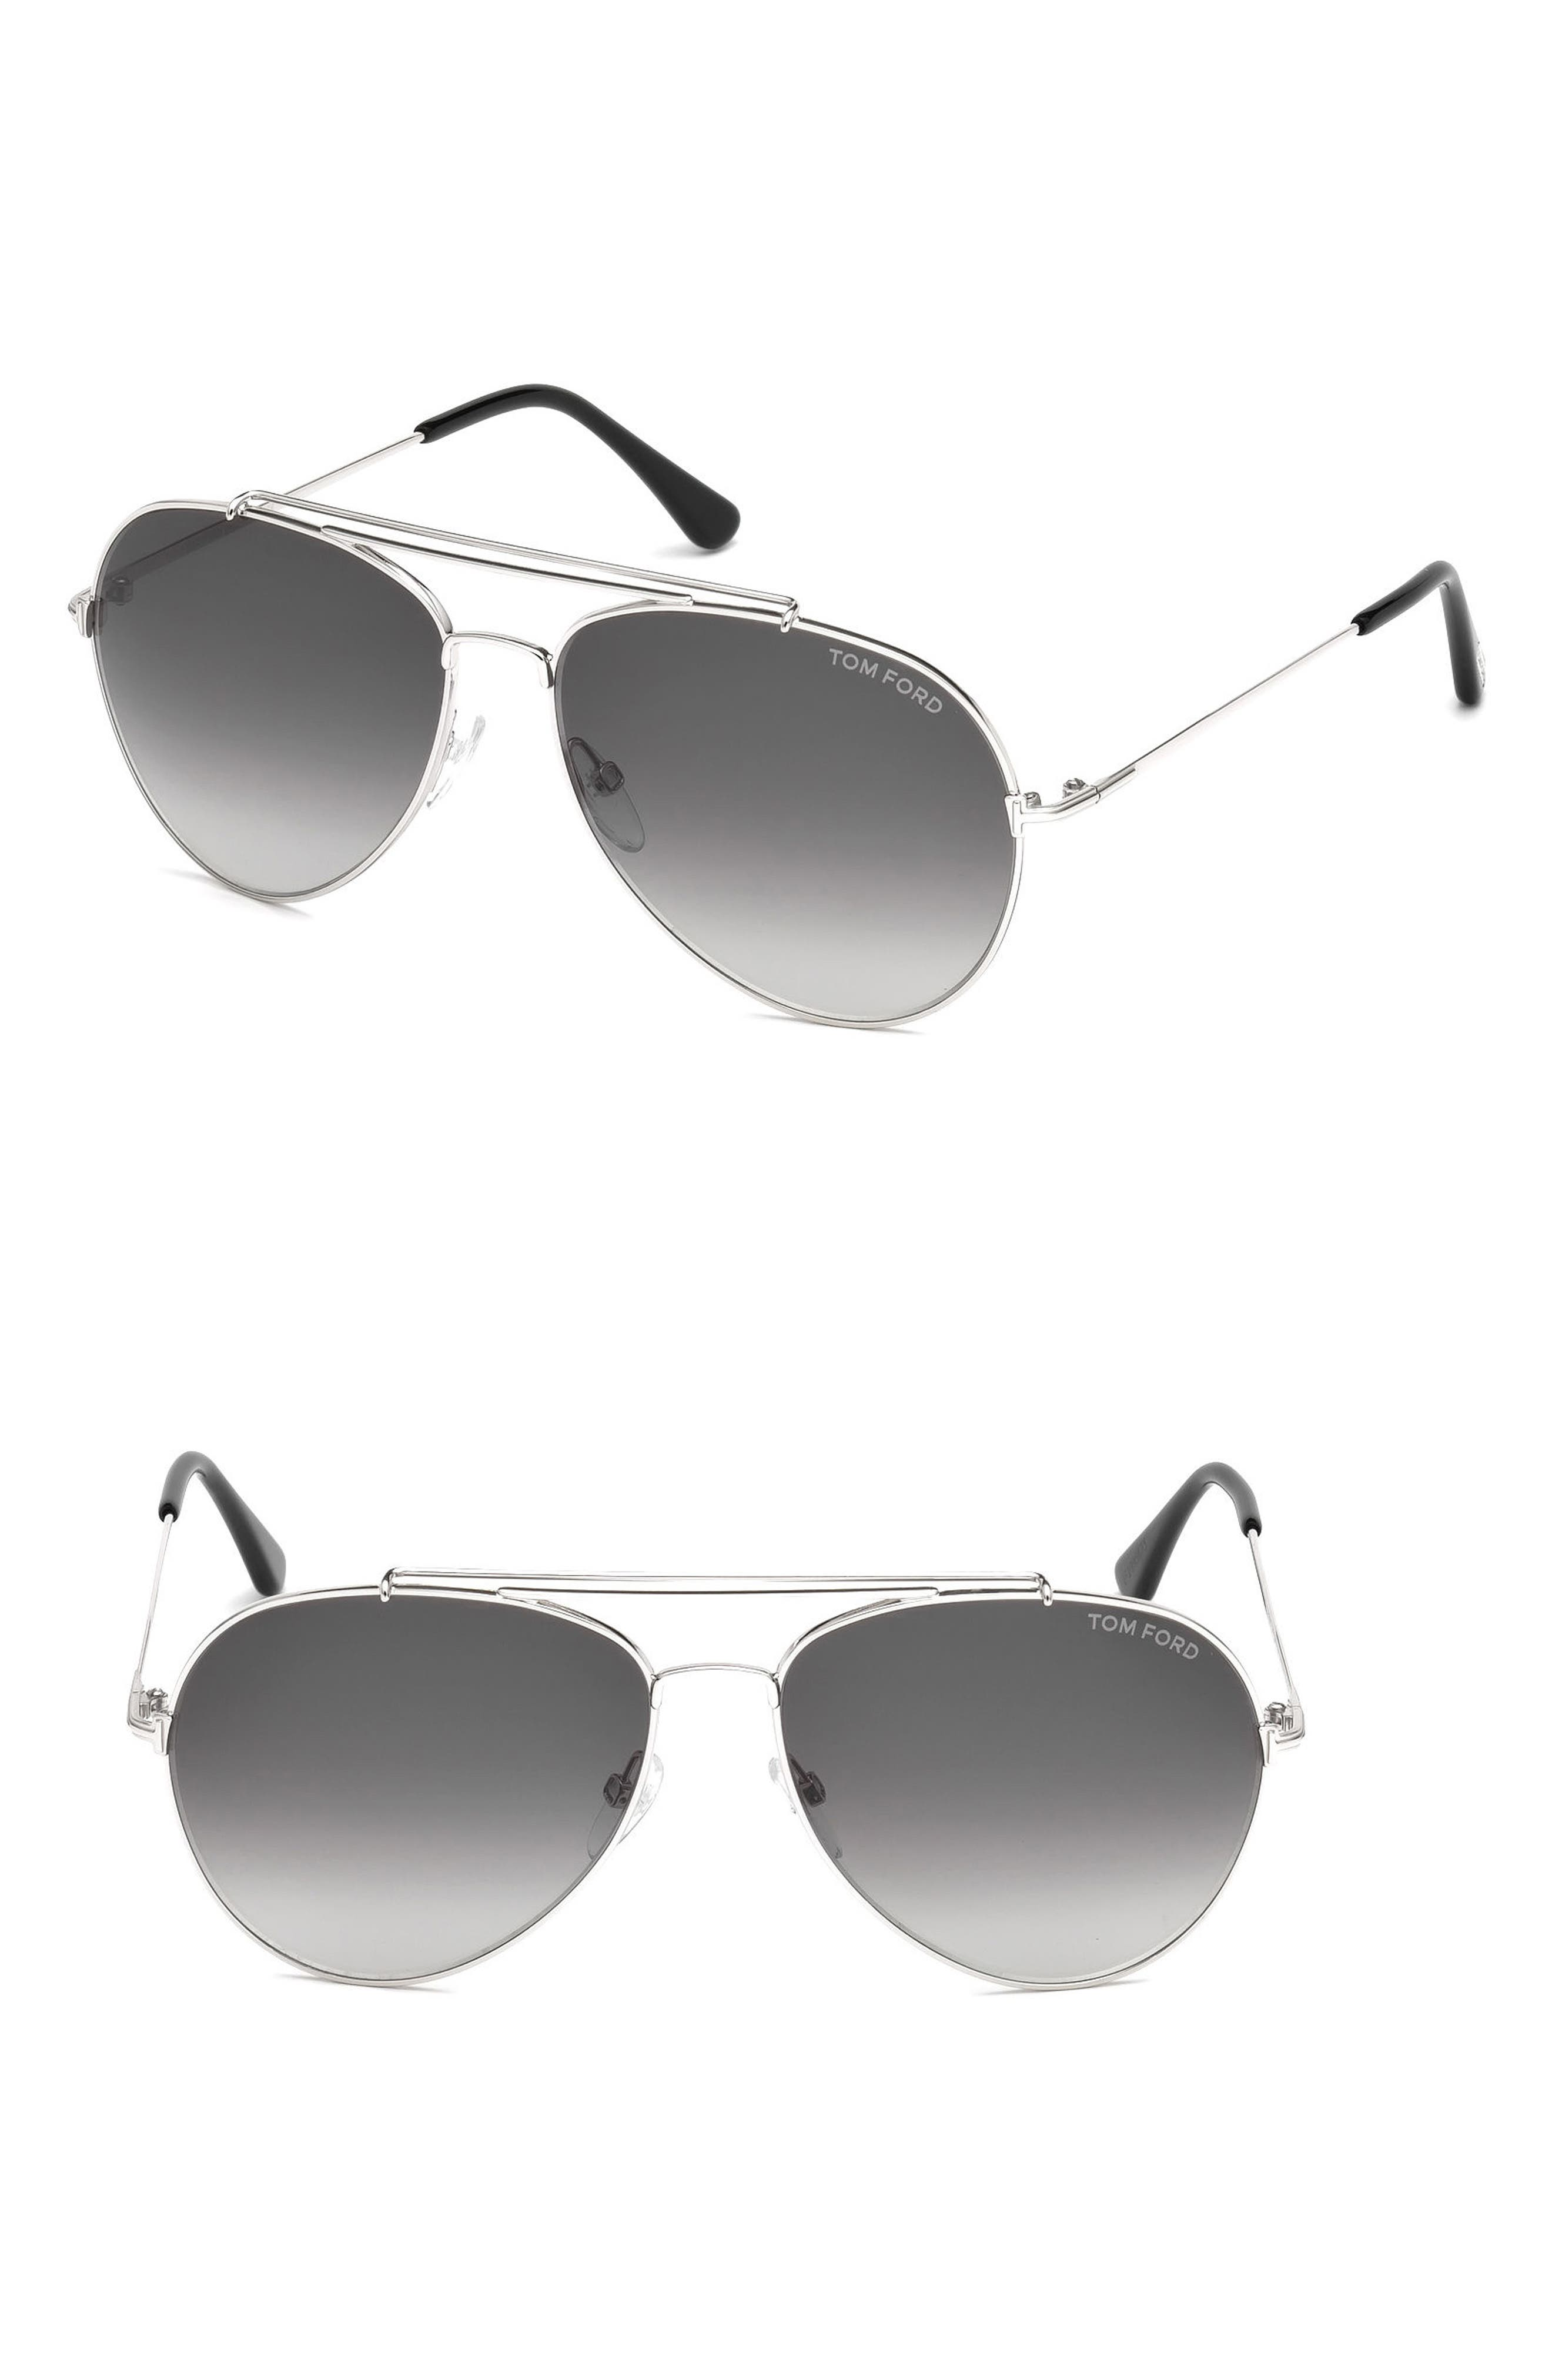 Alternate Image 1 Selected - Tom Ford 'Charles' 62mm Aviator Sunglasses